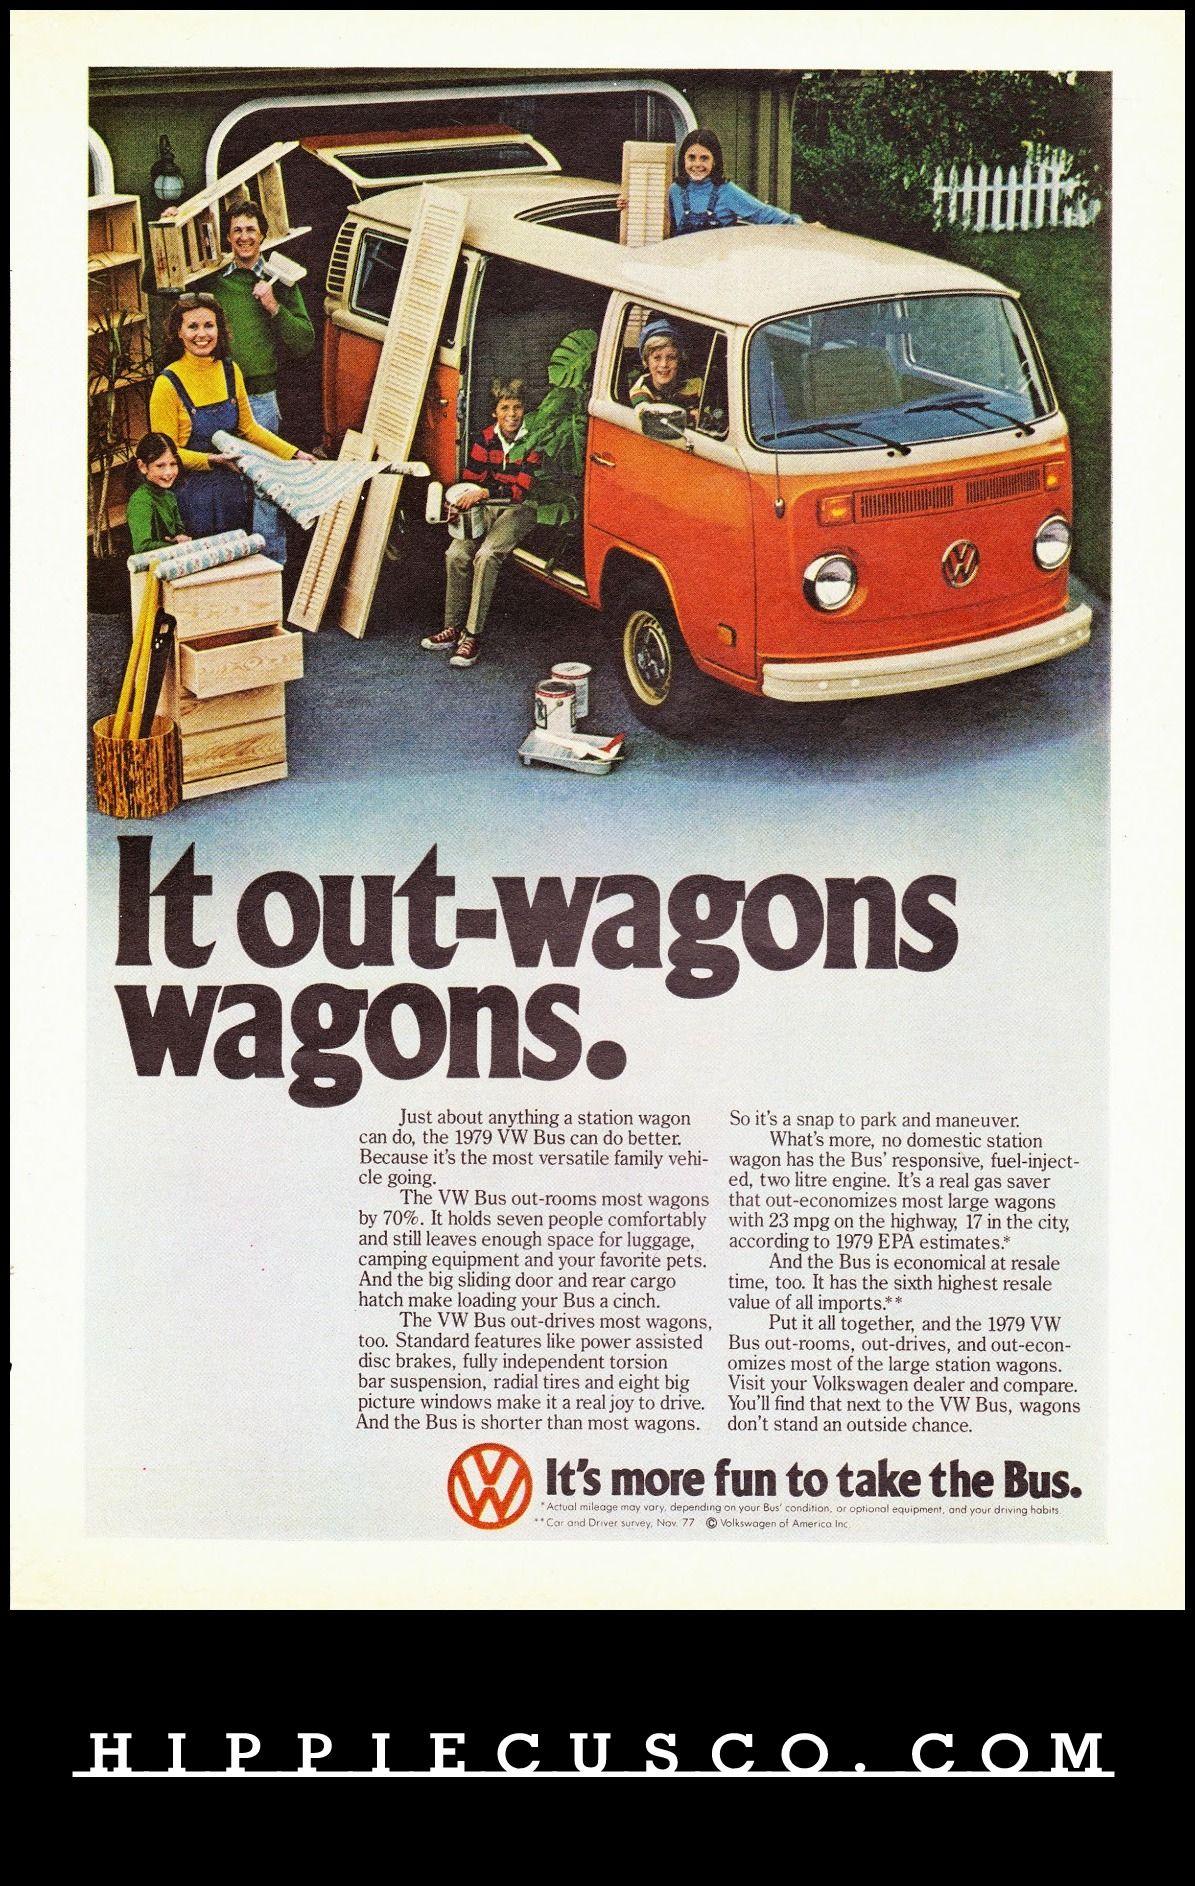 1970 VOLKSWAGEN Bus Microbus Van Versus Station Wagon VINTAGE AD